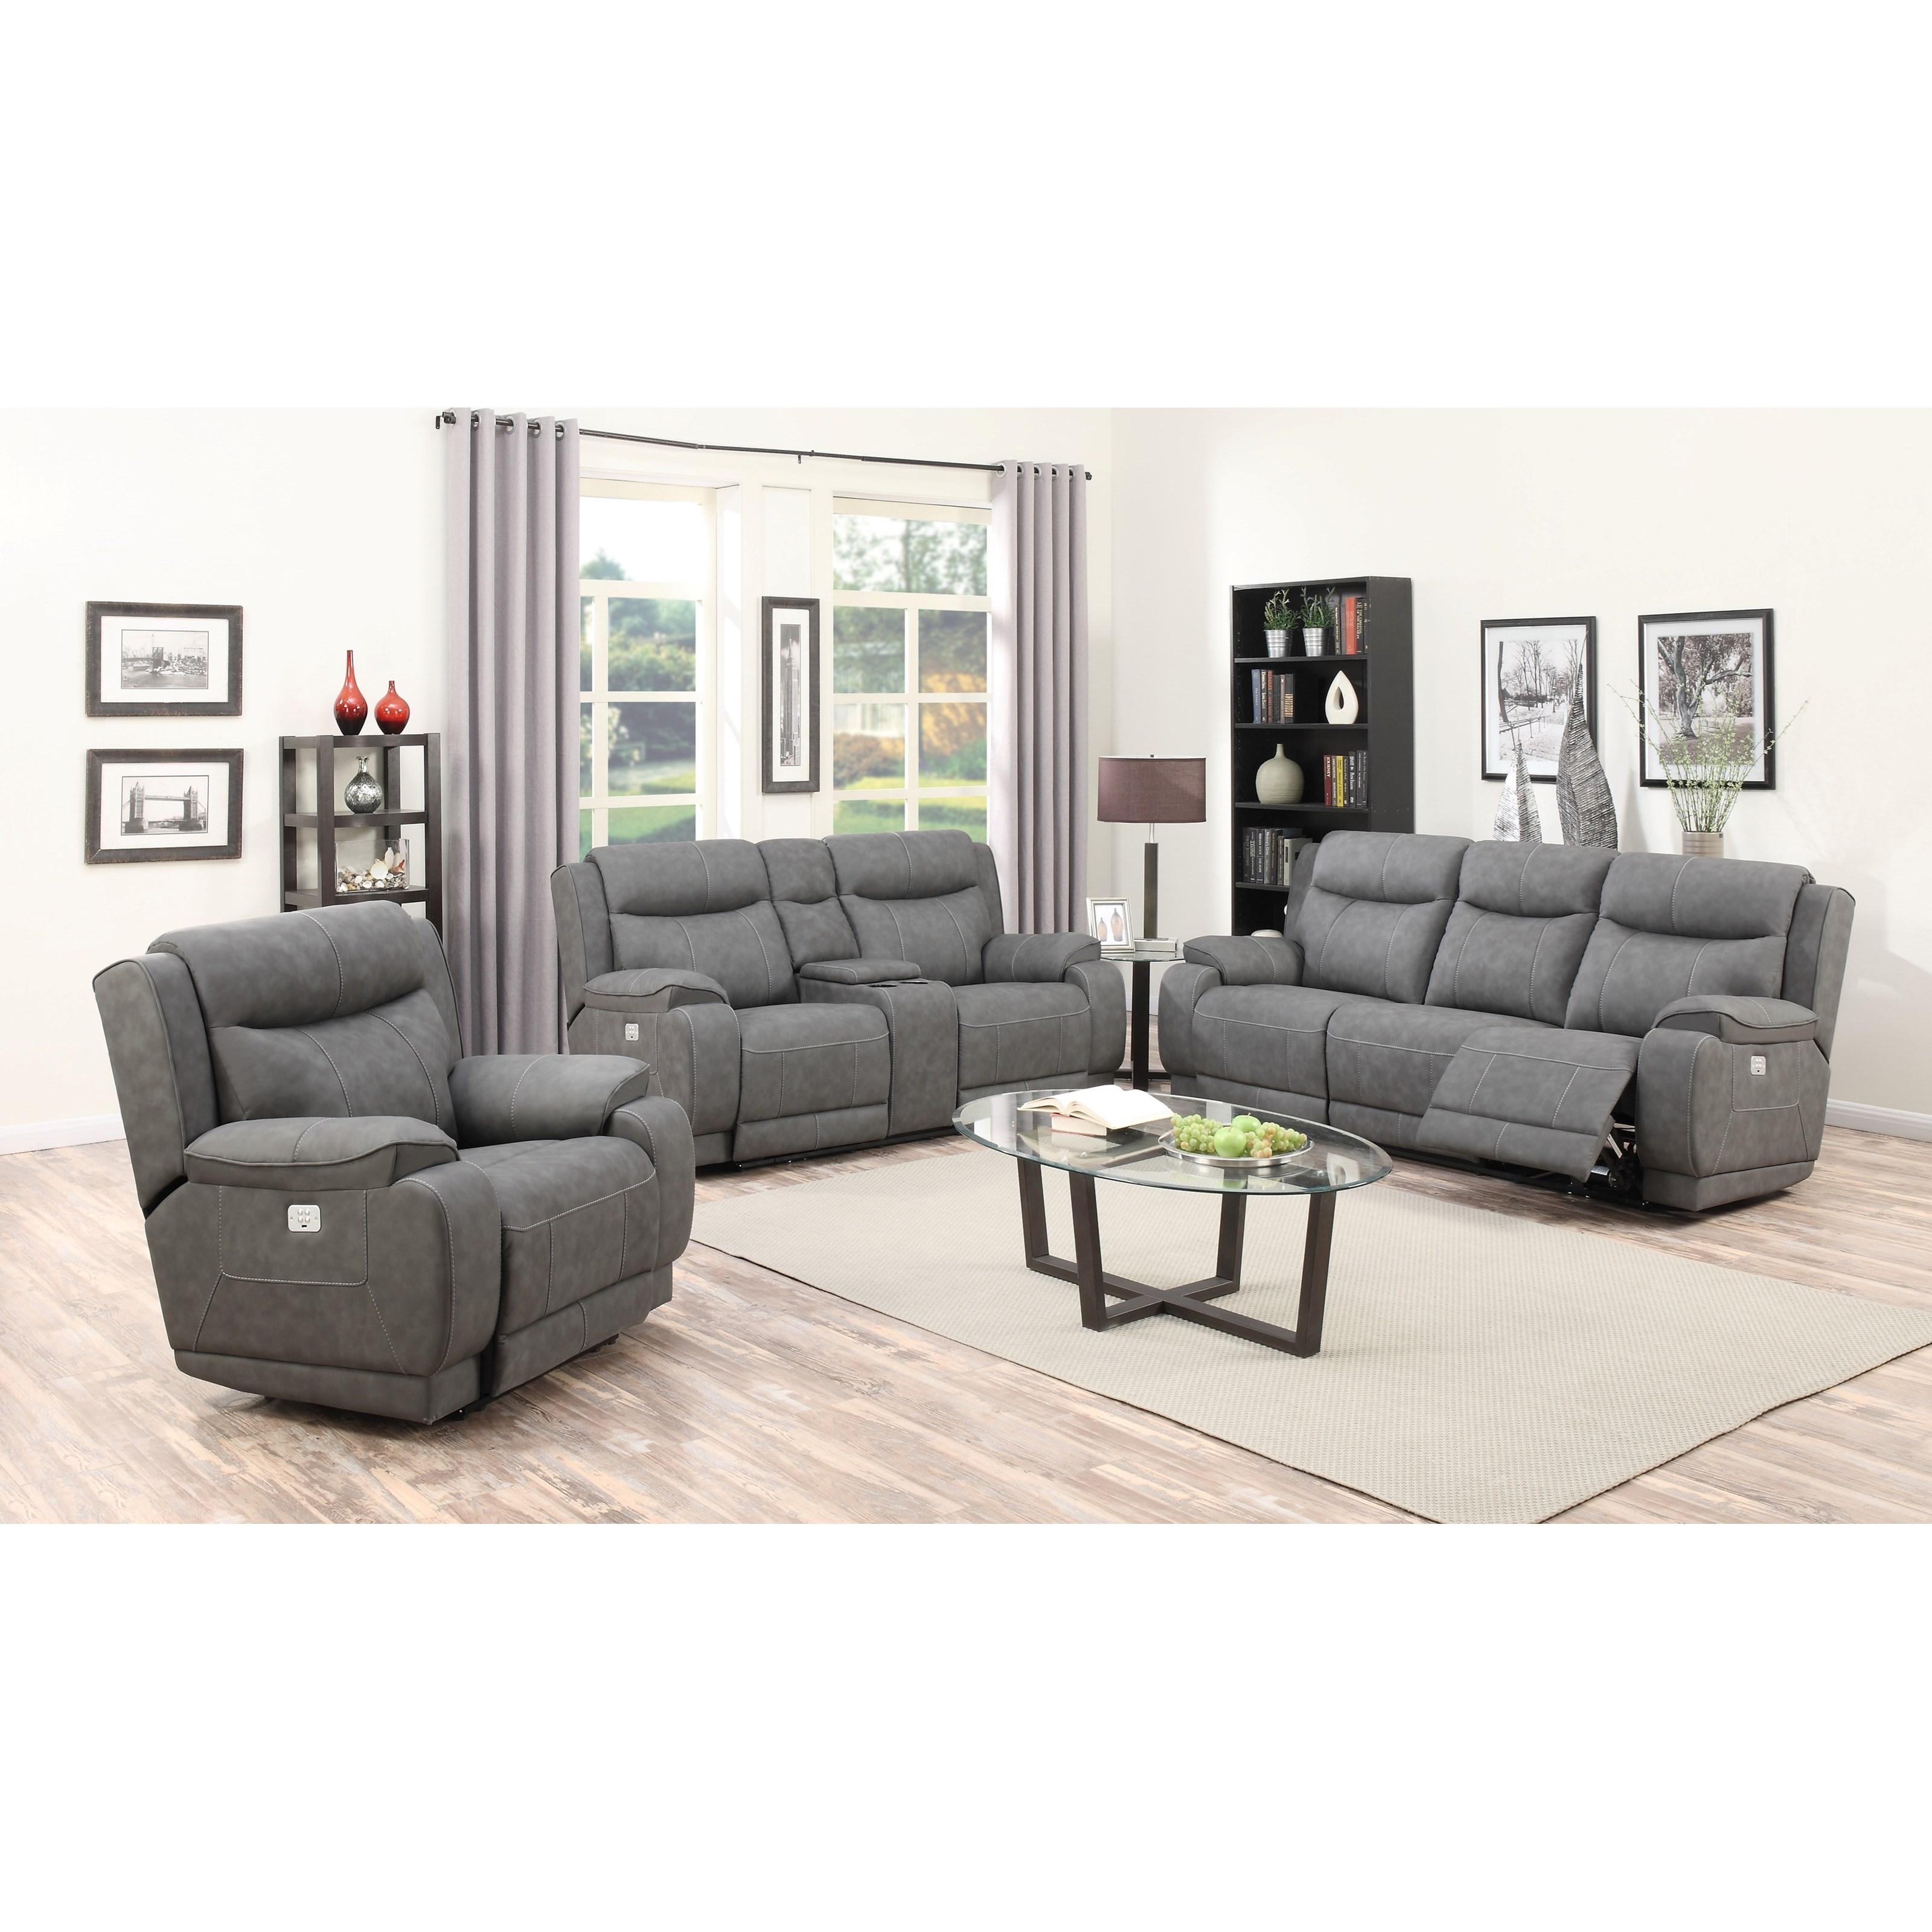 Klaussner international humphrey us reclining living room for Living room furniture groups